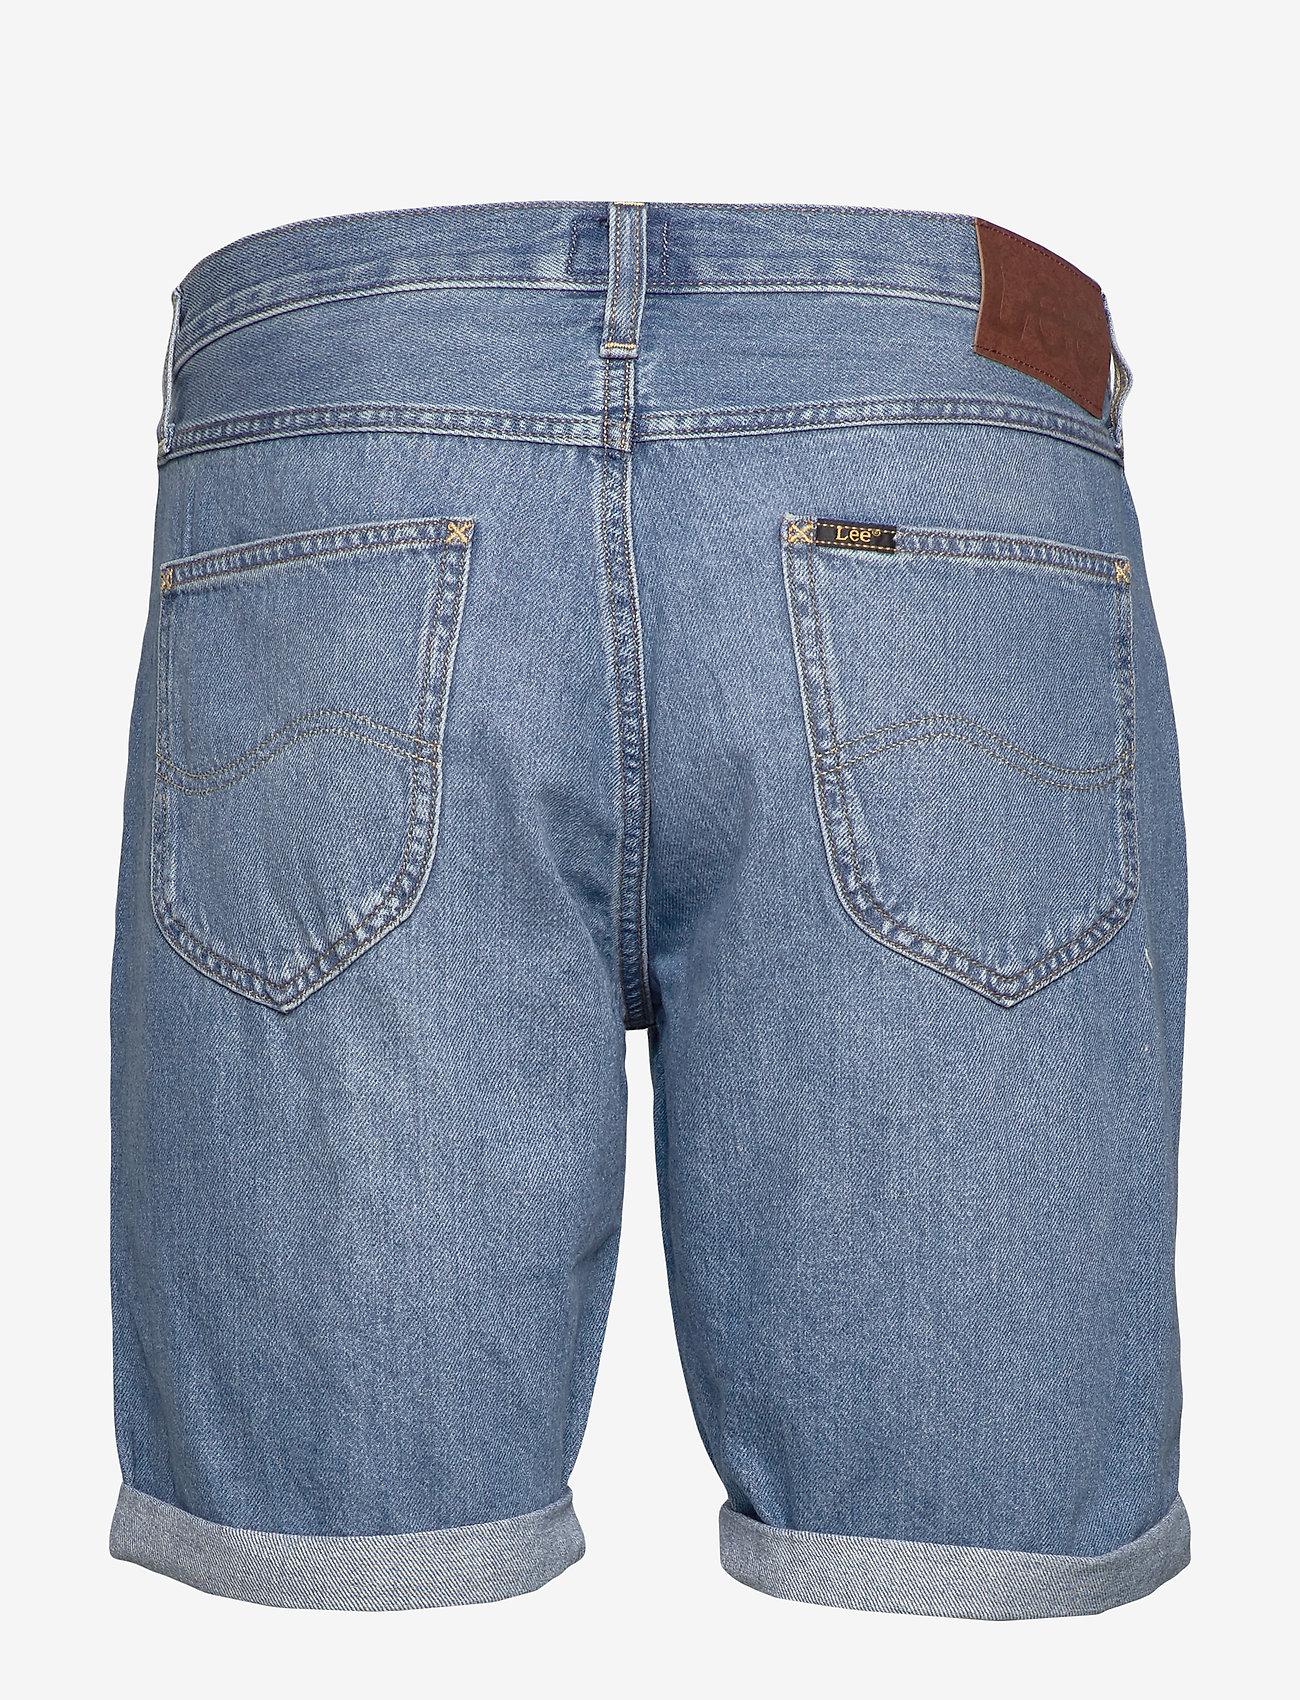 Lee Jeans - 5 POCKET SHORT - denim shorts - baybridge - 1